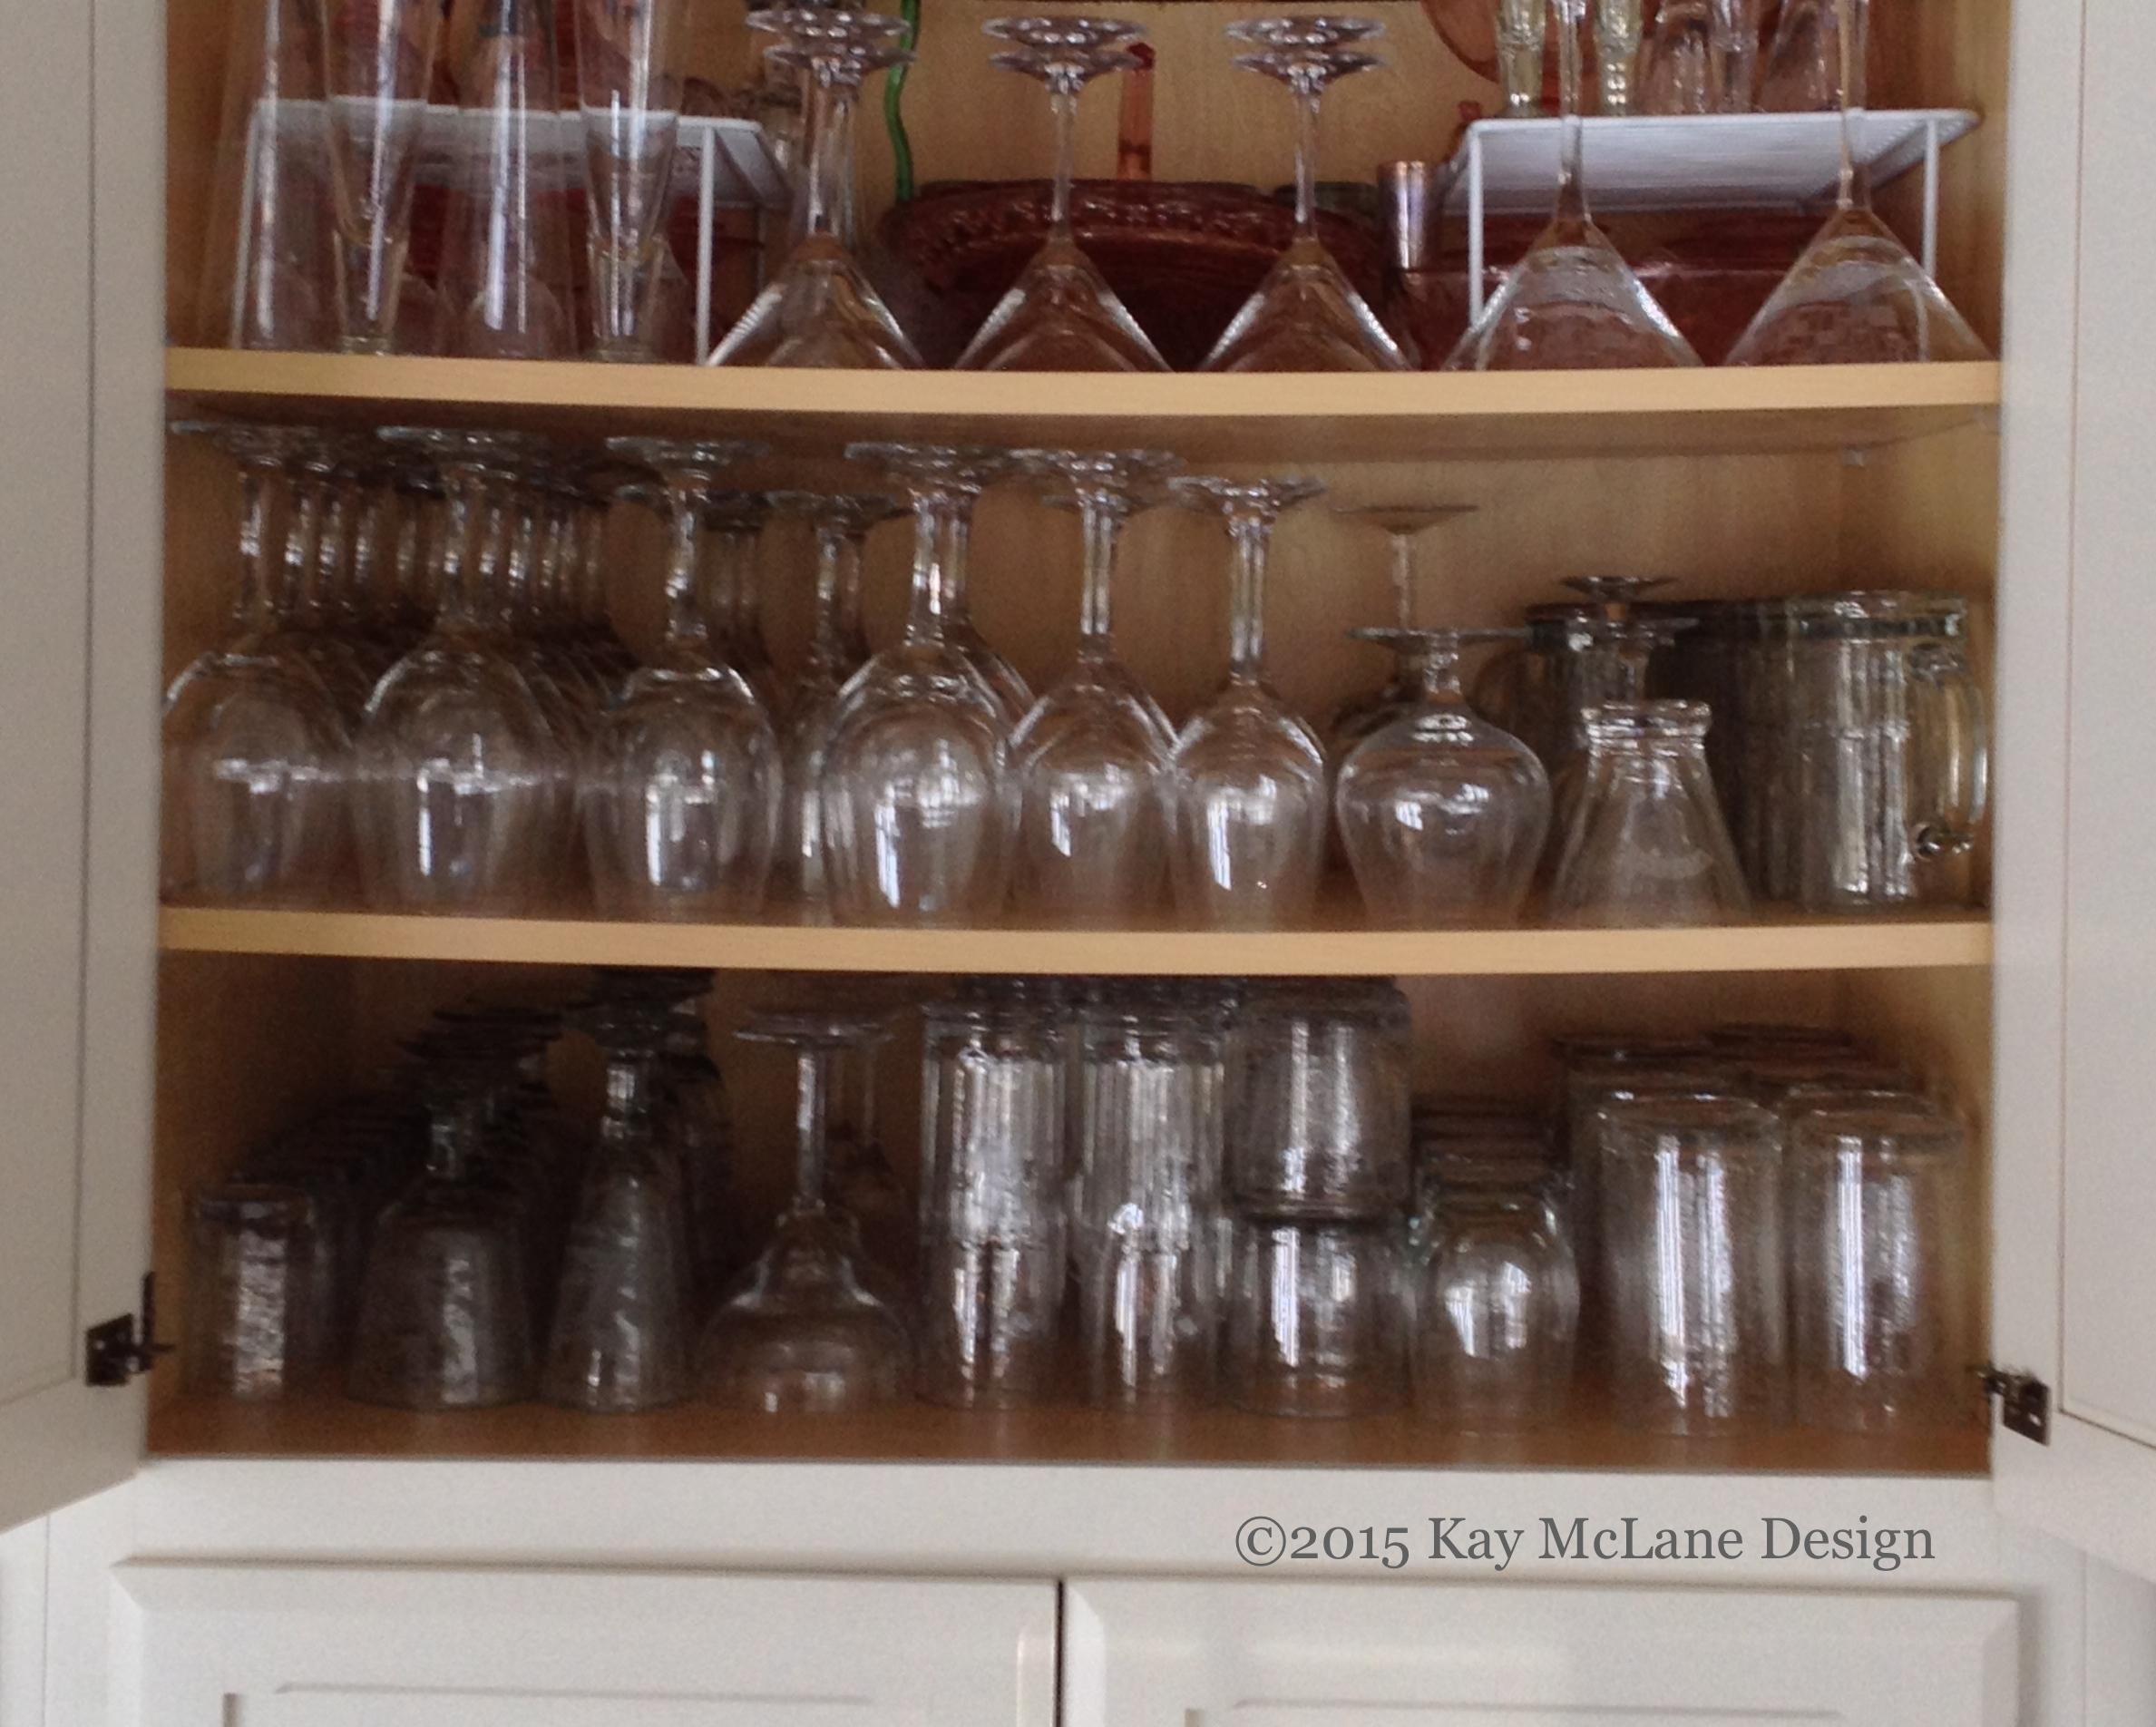 Organizing Your Refrigerator Kay Mclane Design Llc